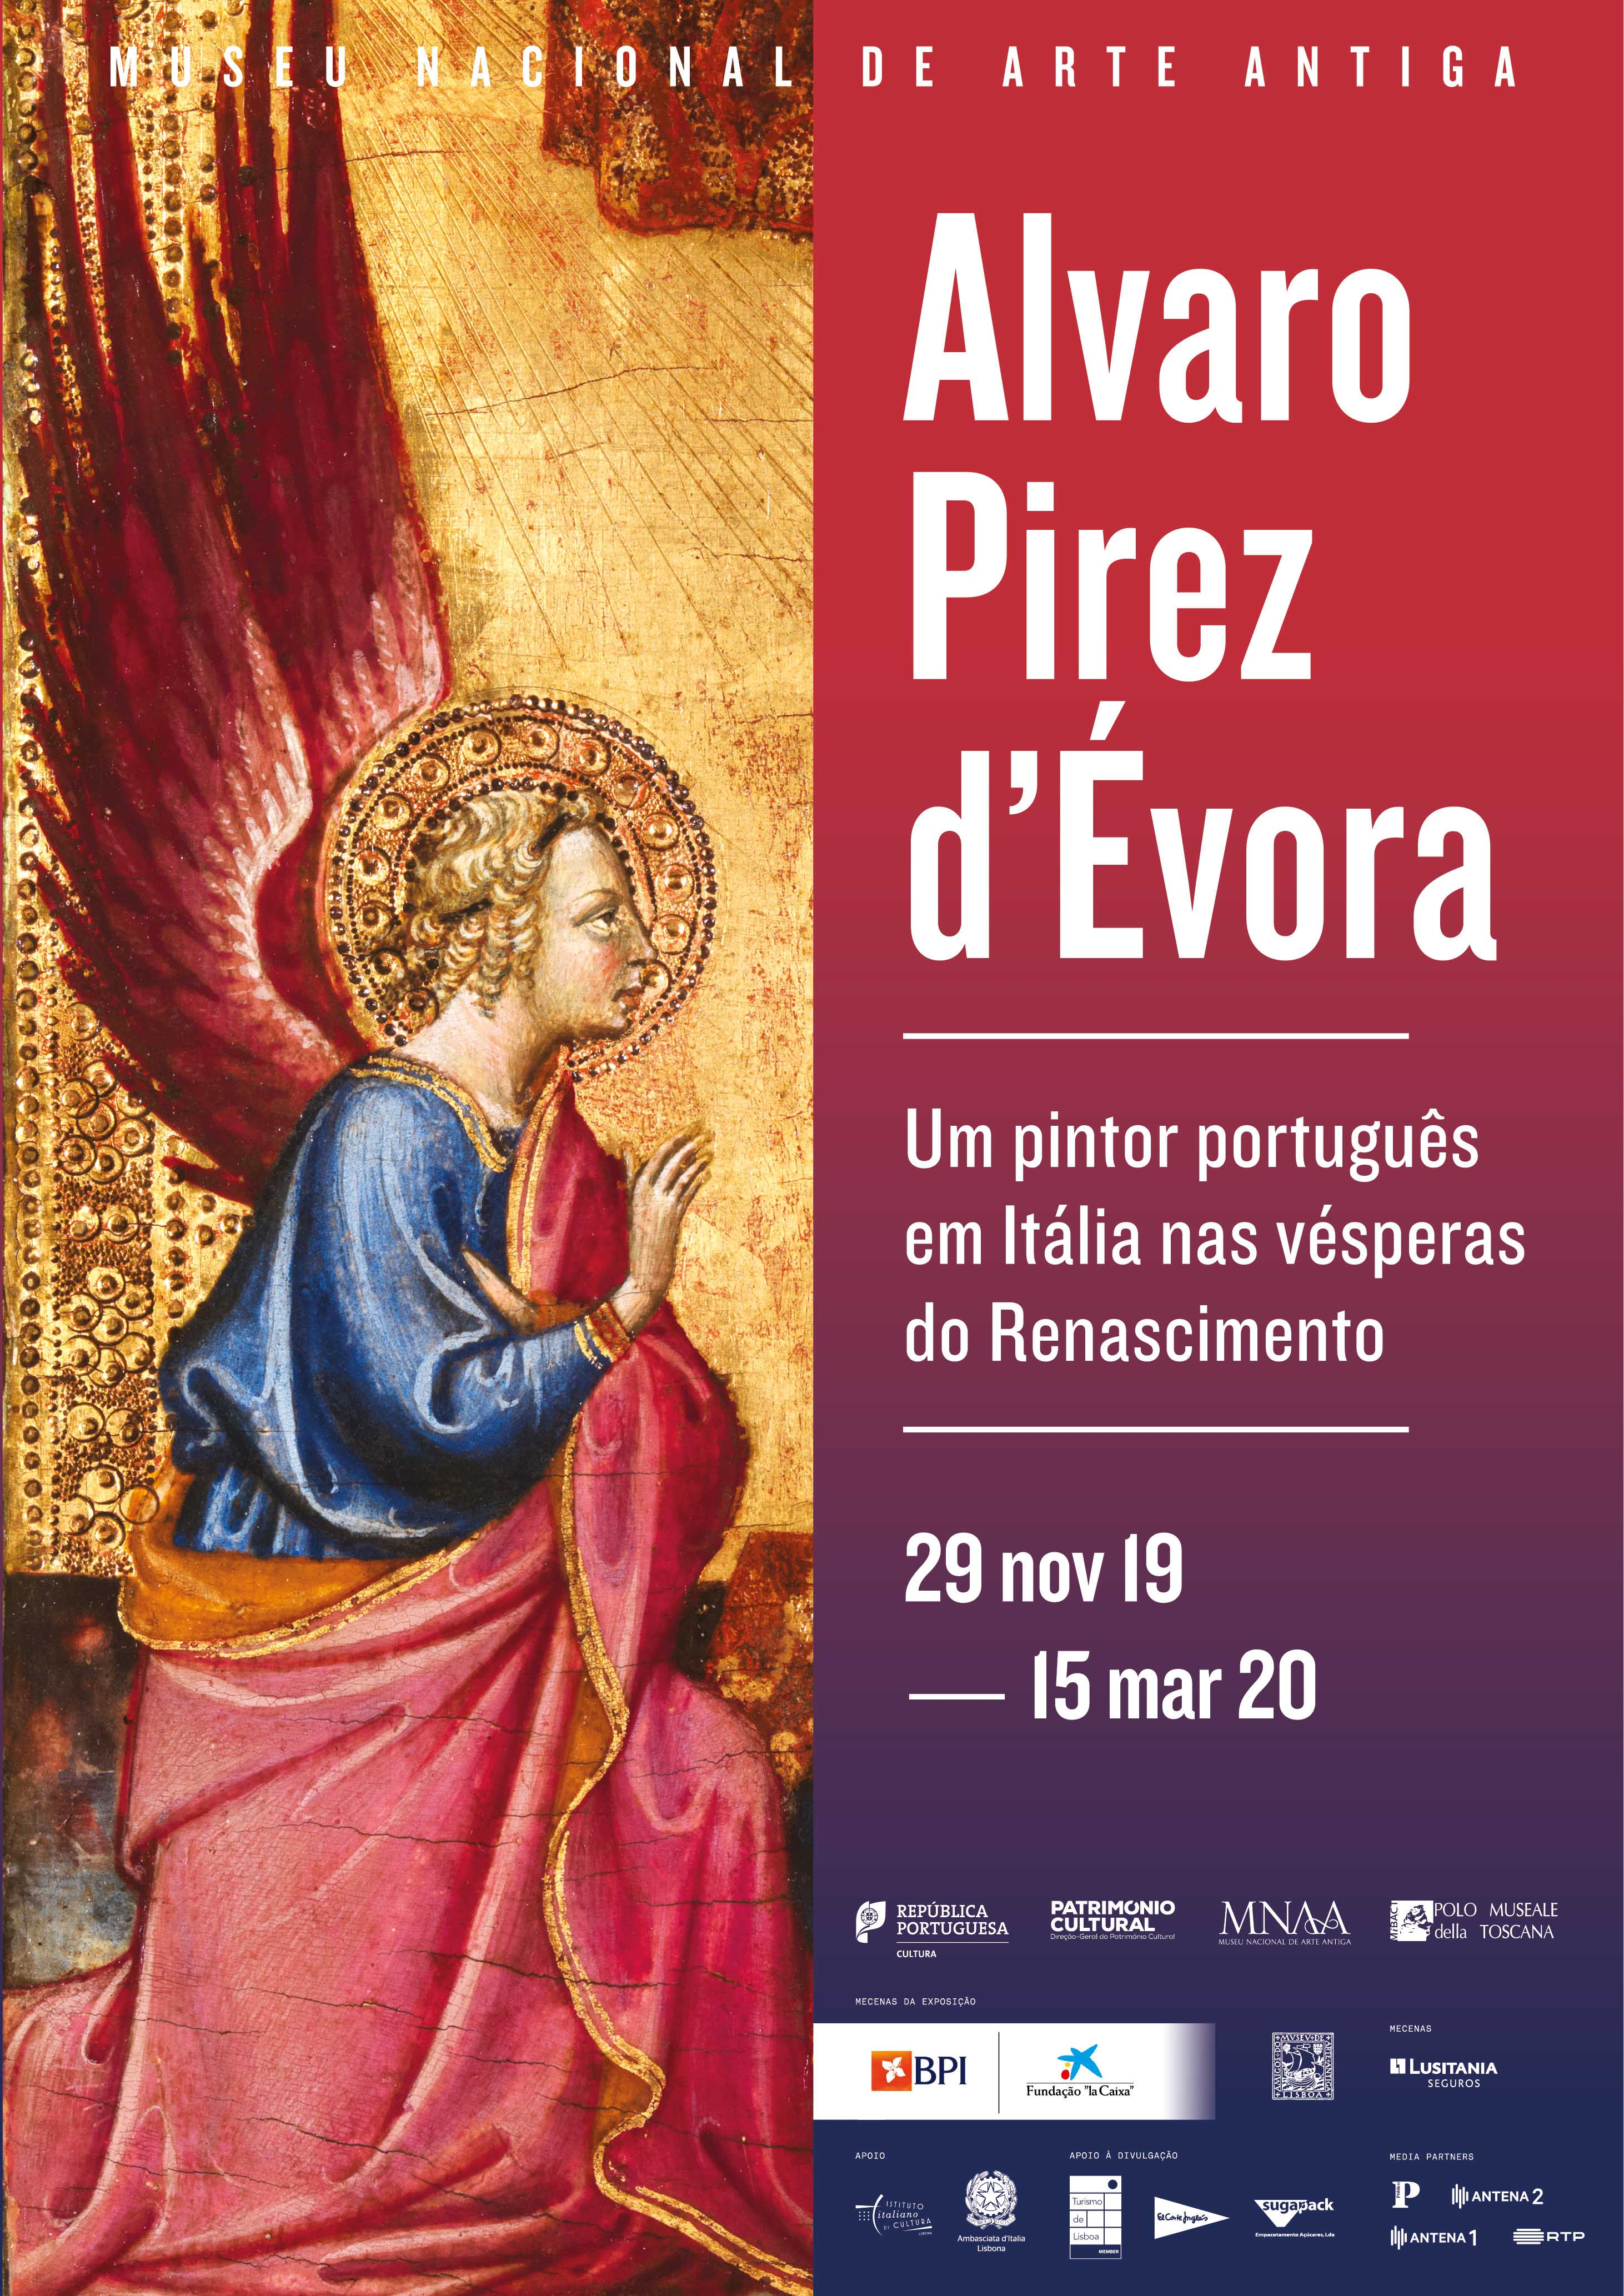 2019 EXPO Alvaro Pires cartaz